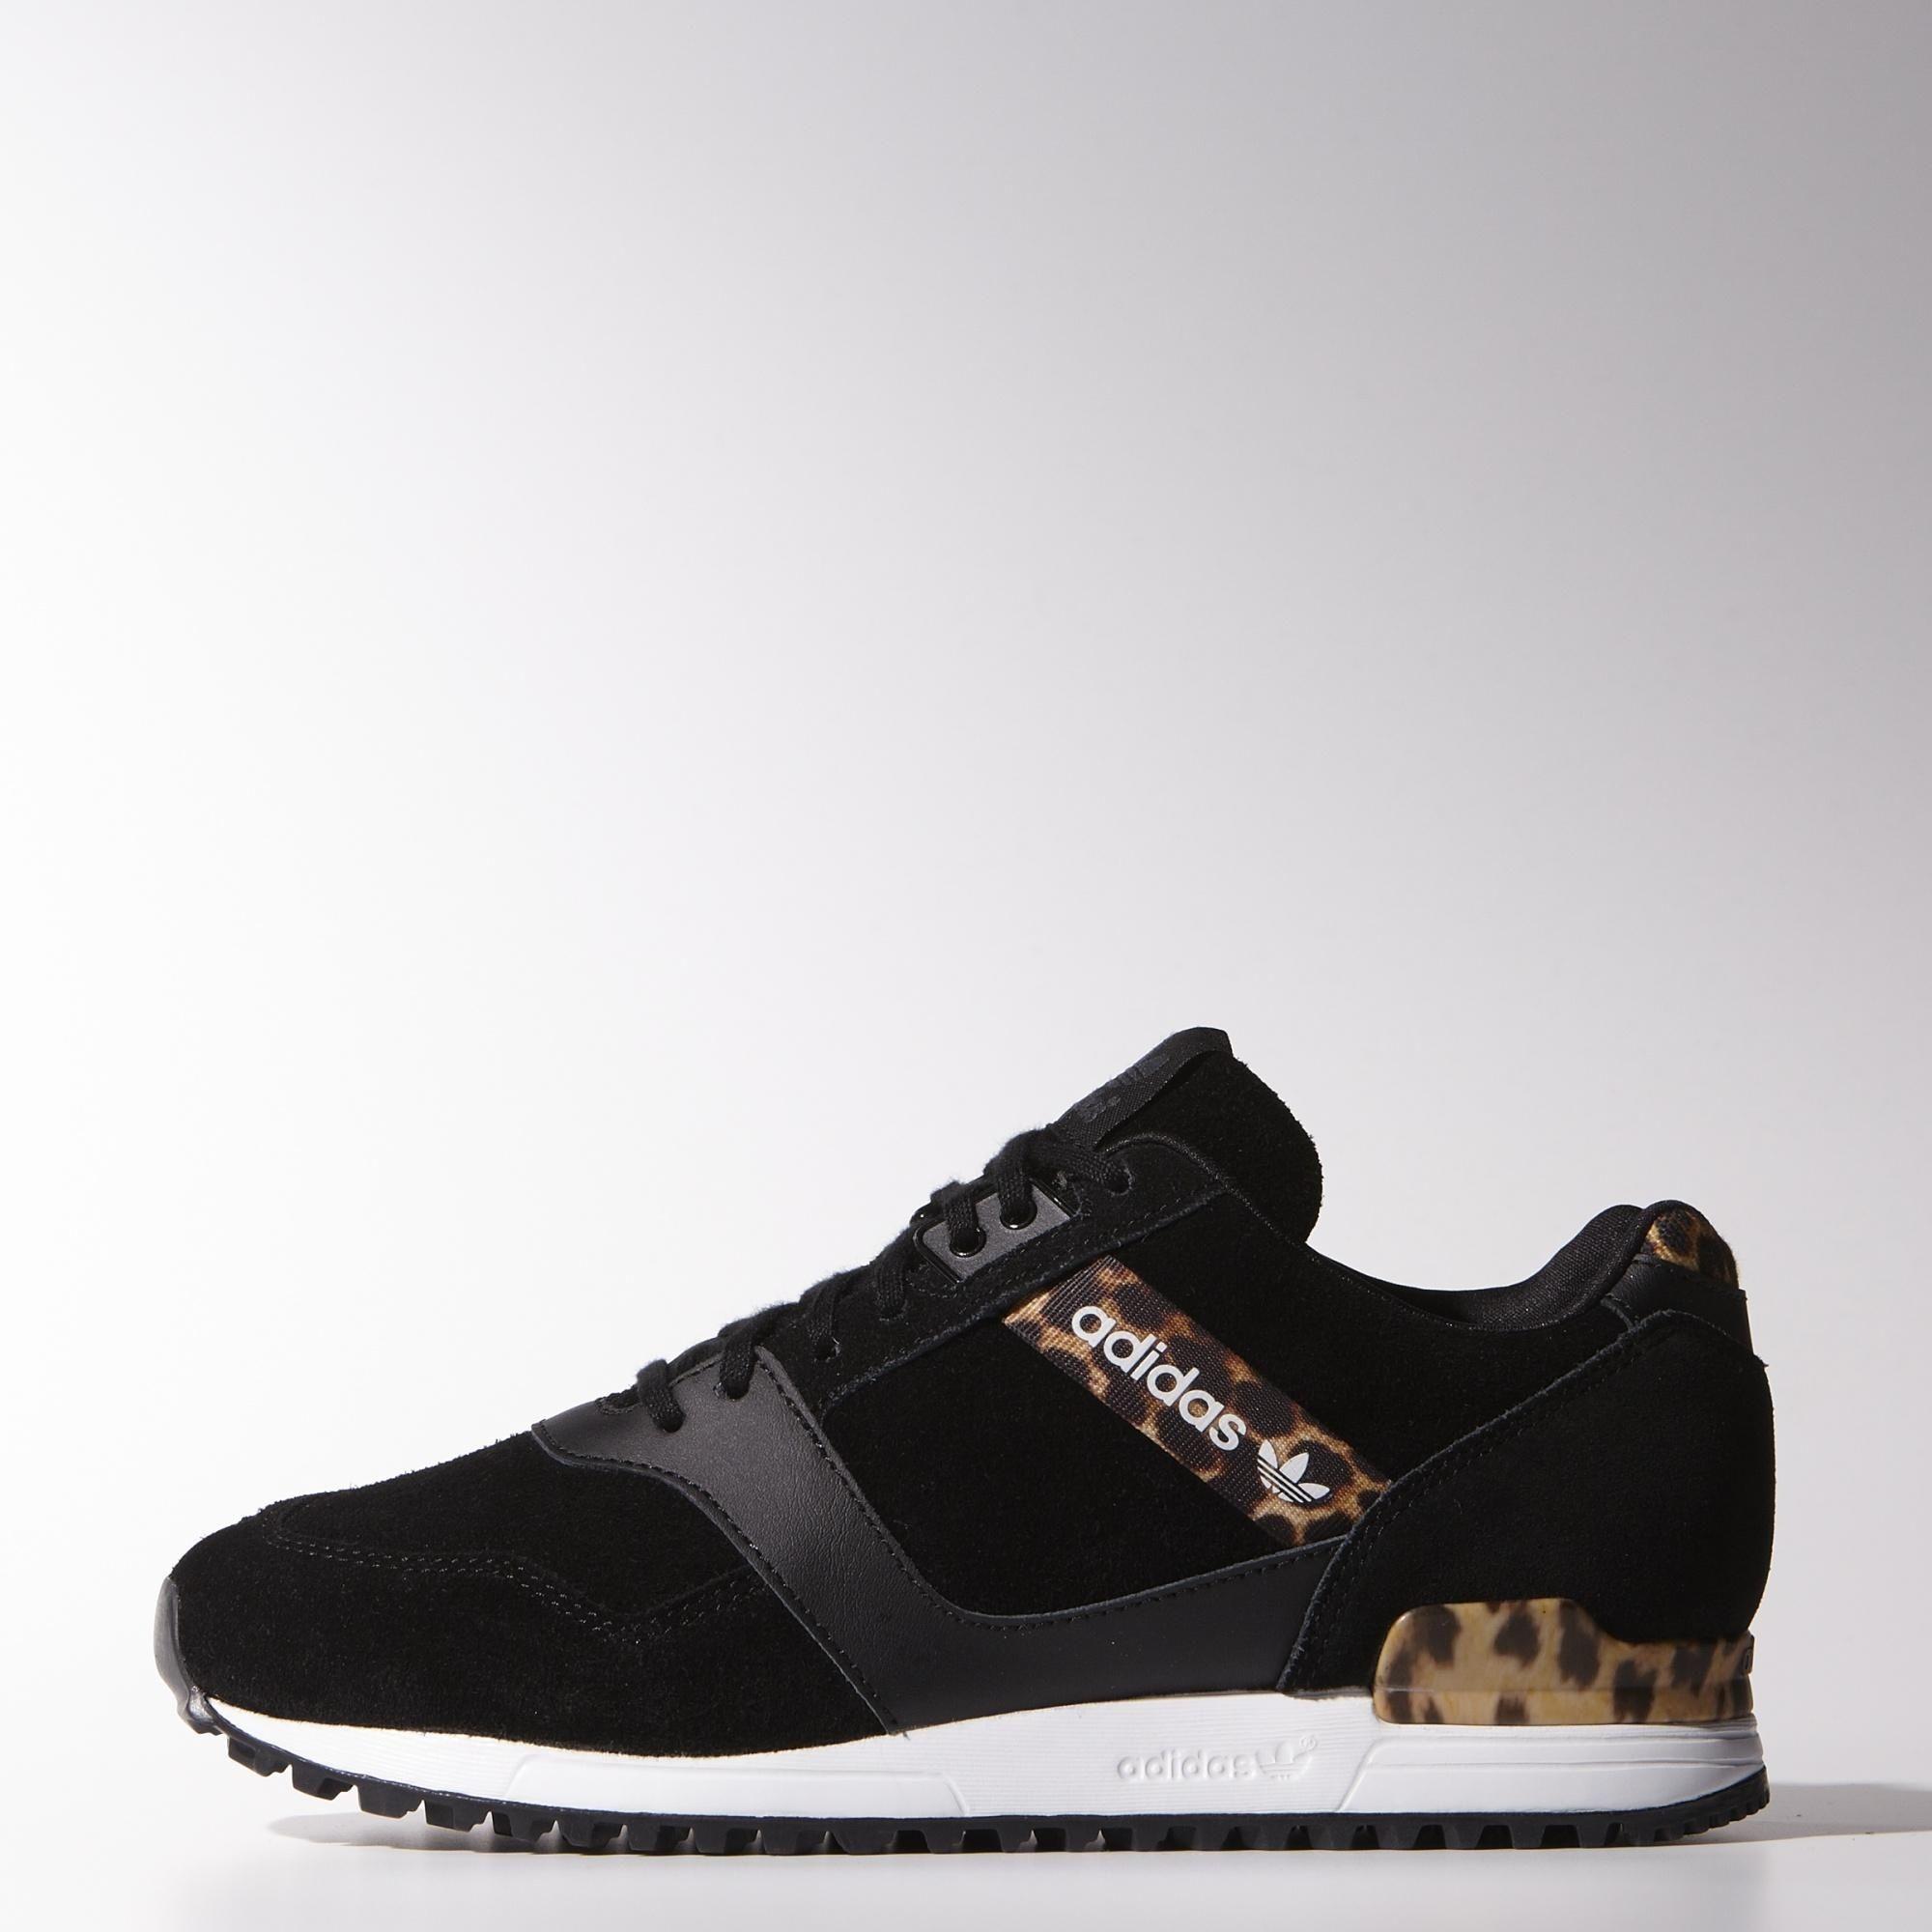 adidas zx contemp animal print trainers uk